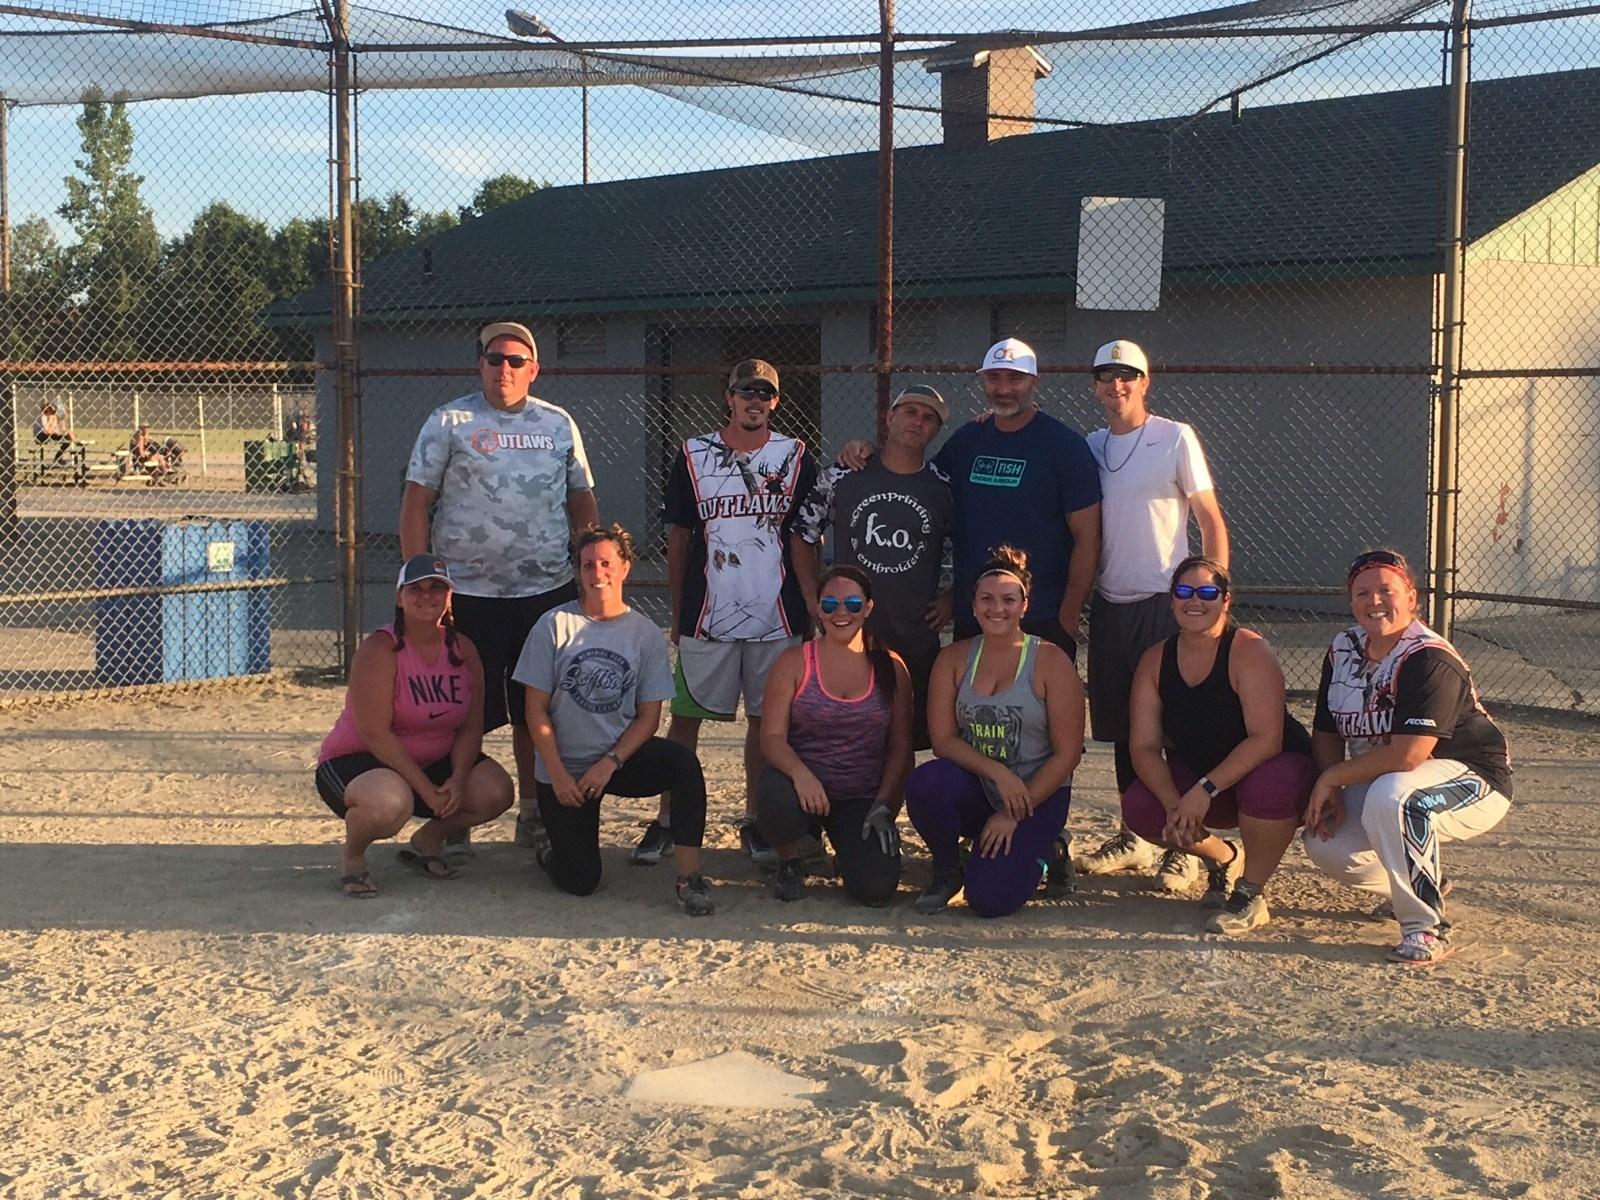 Sunday night co-ed softball champs, Outlaws